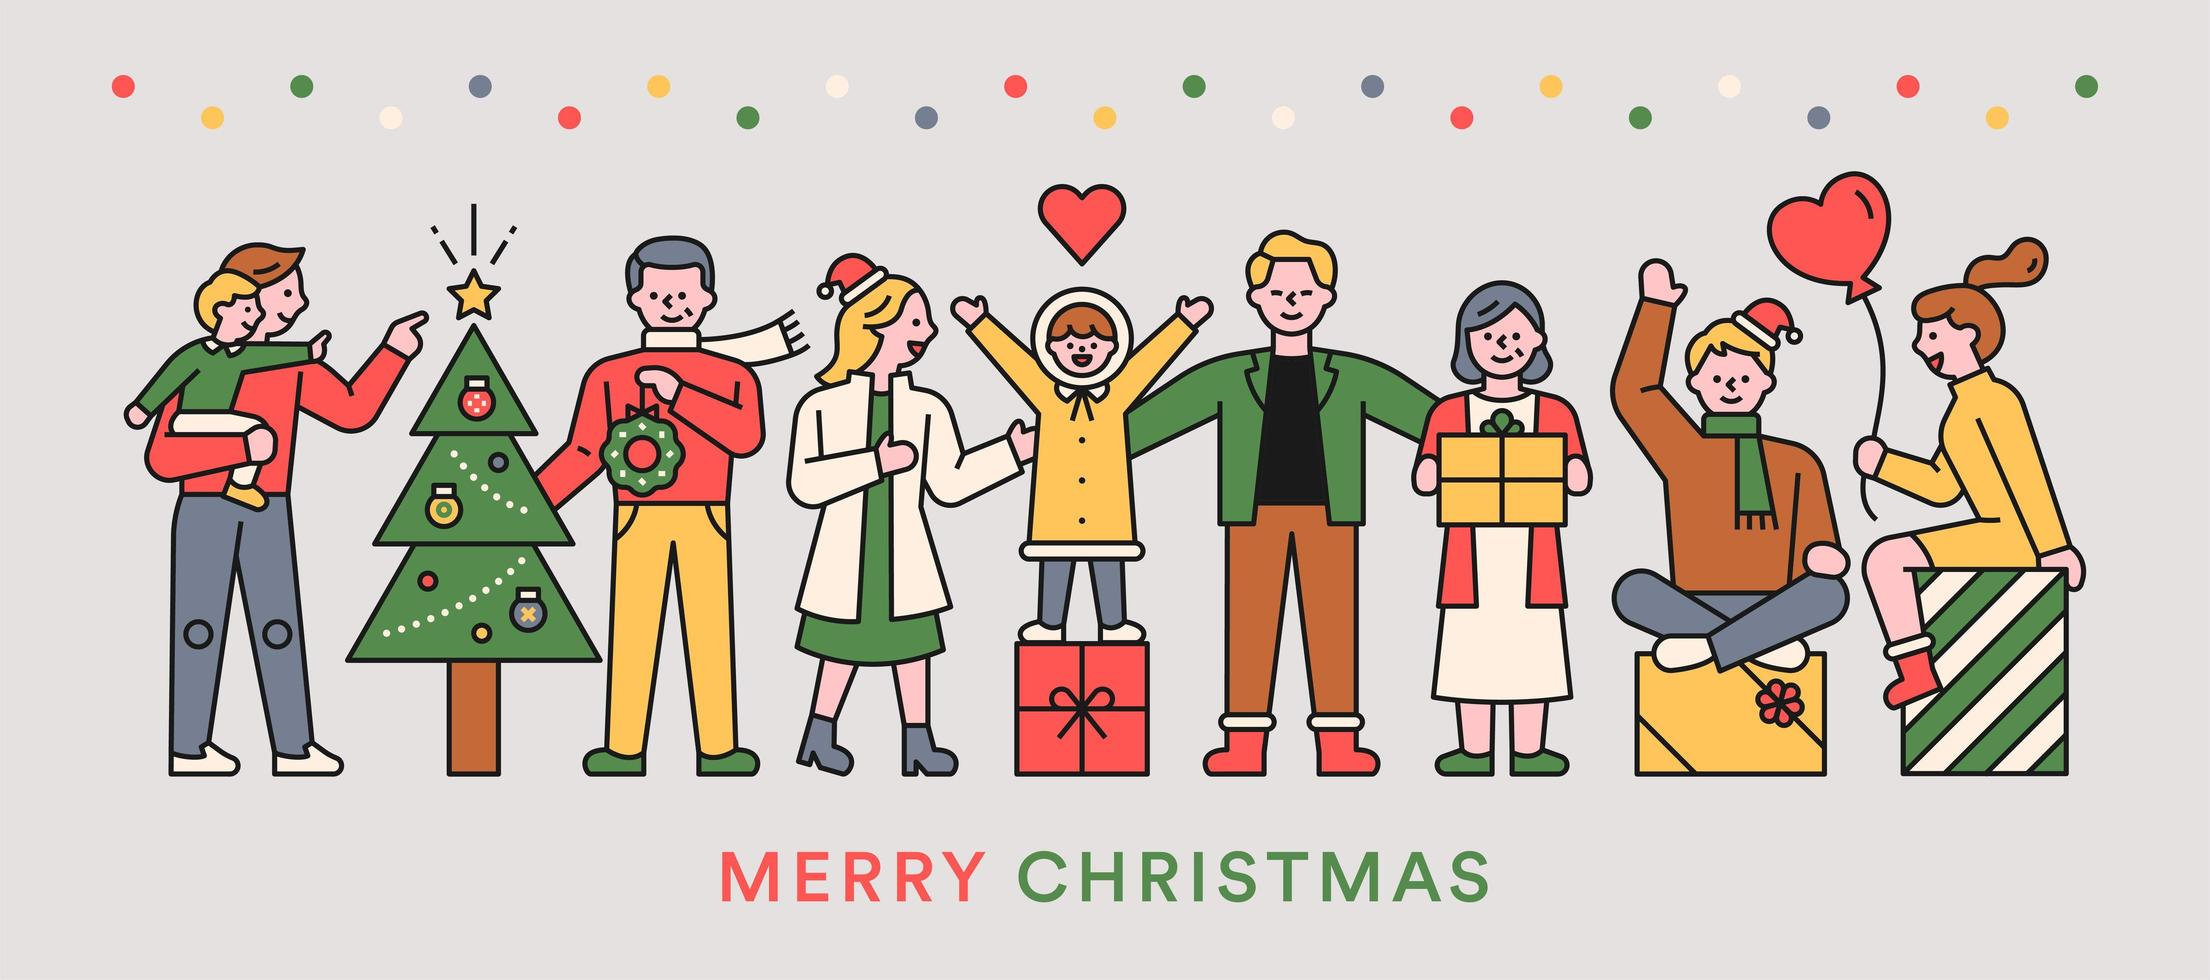 Merry Christmas people vector